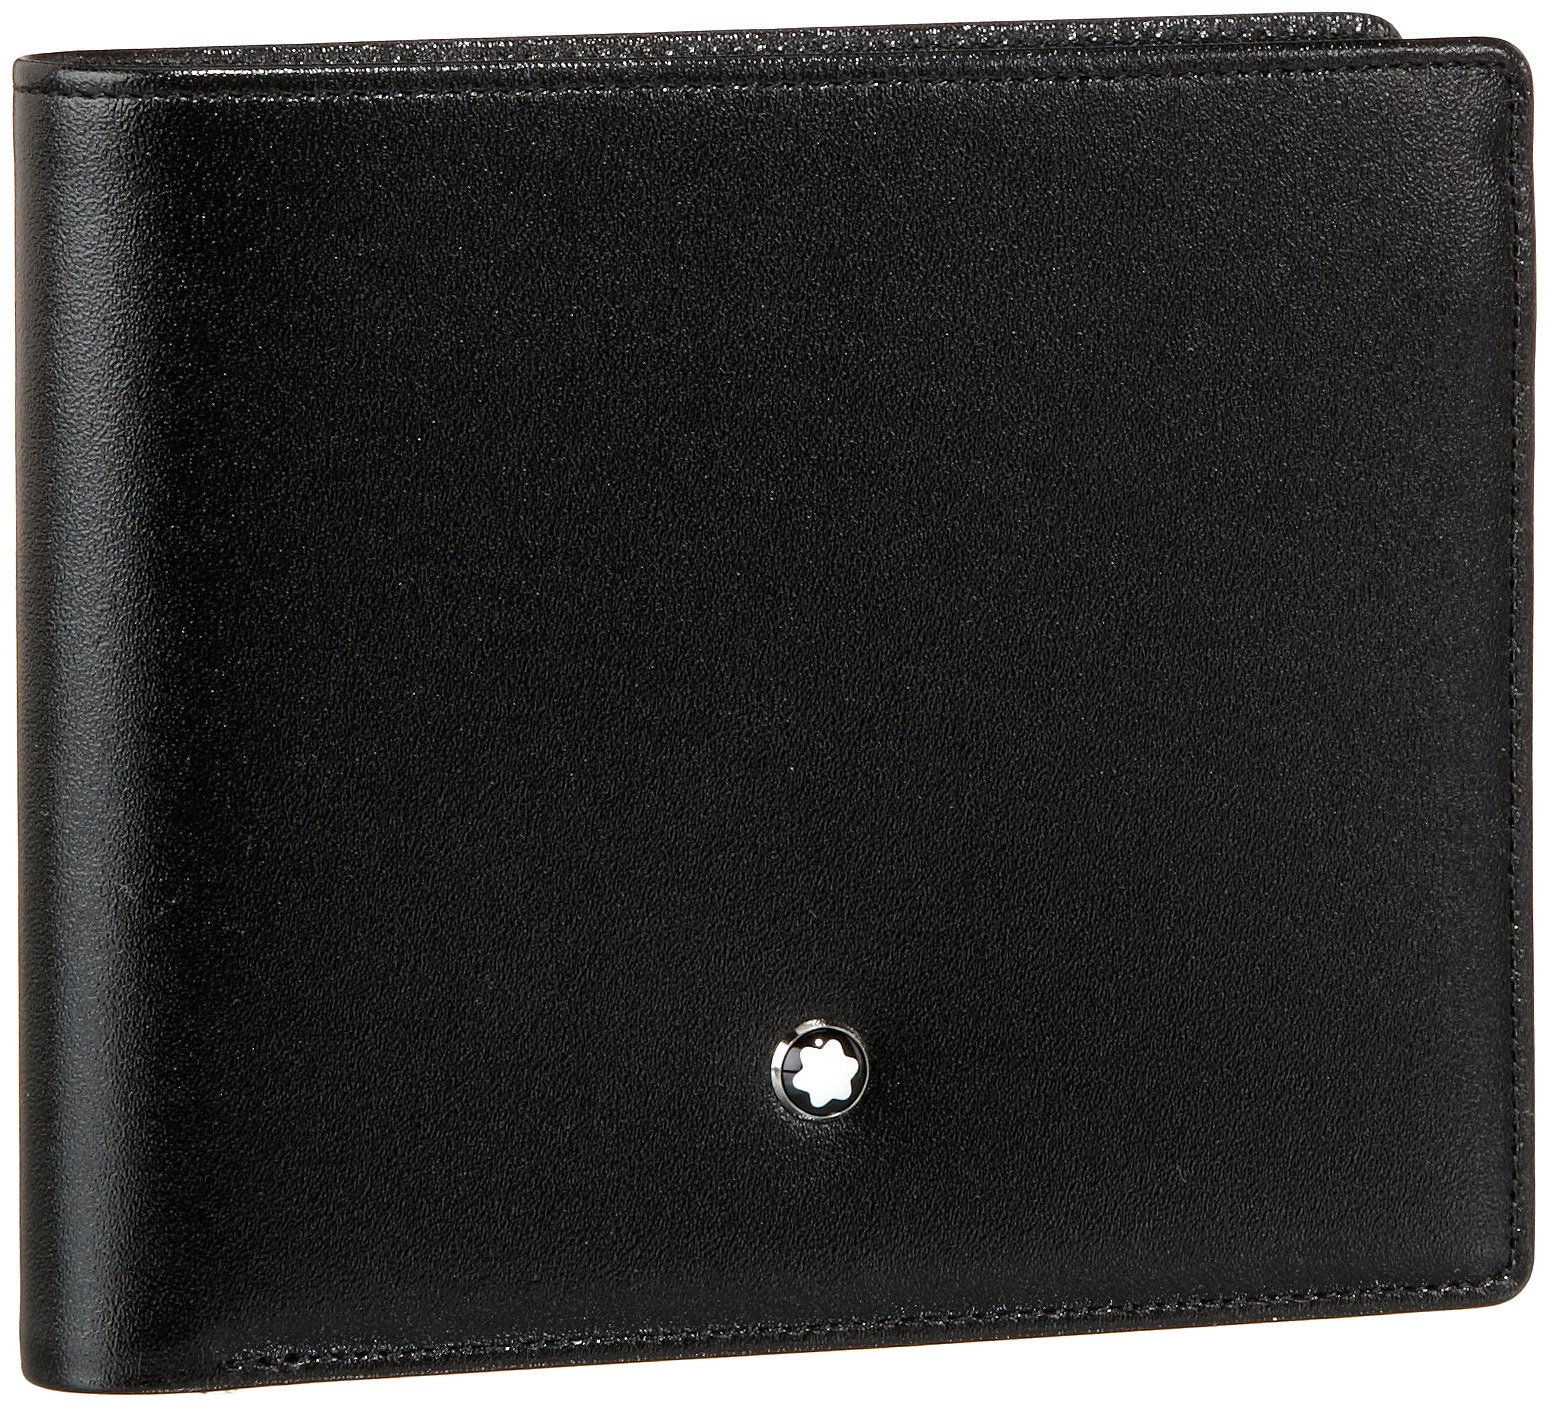 Montblanc Meisterstuck Men's Medium Leather Wallet 7162